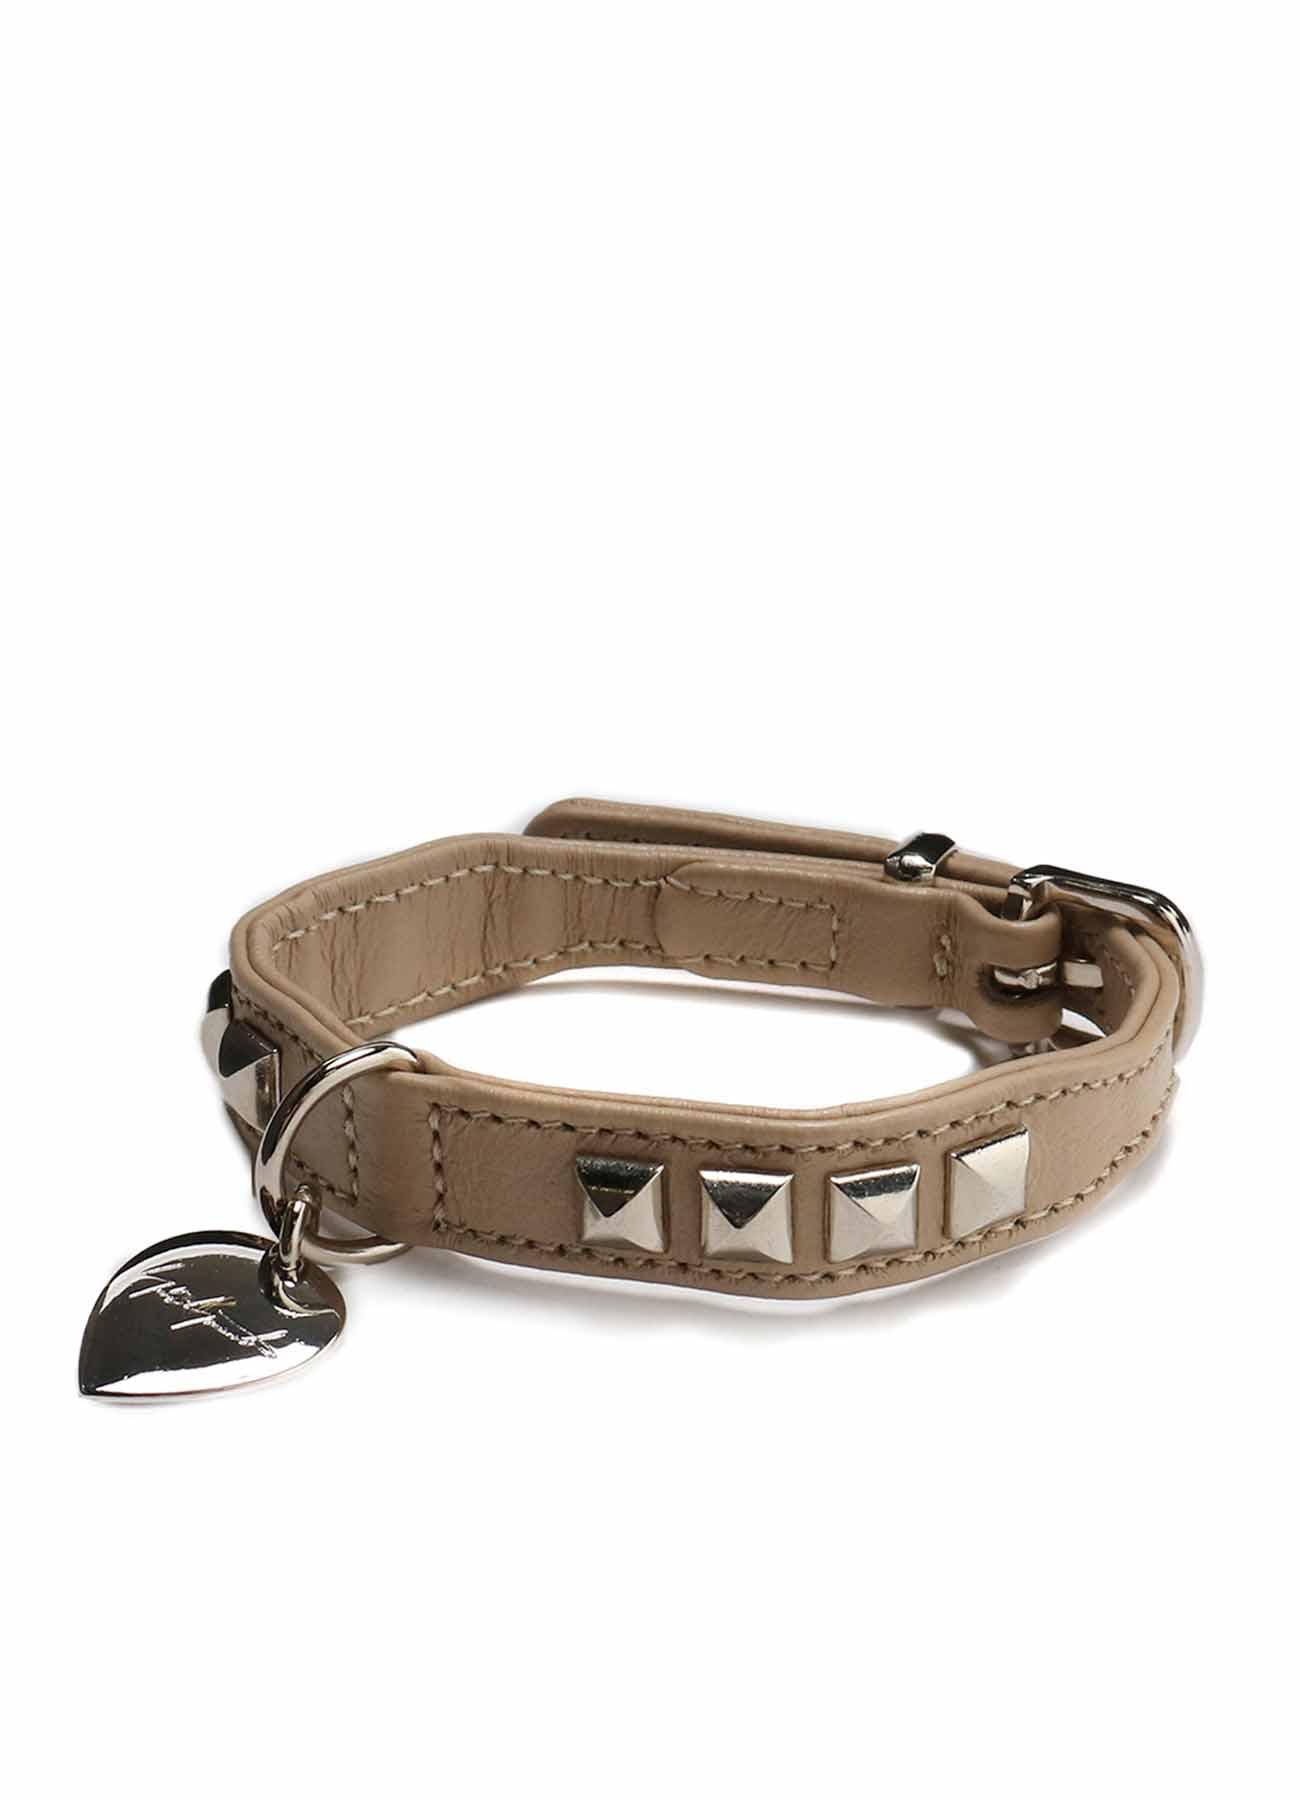 HUNTER×discord Dog collar